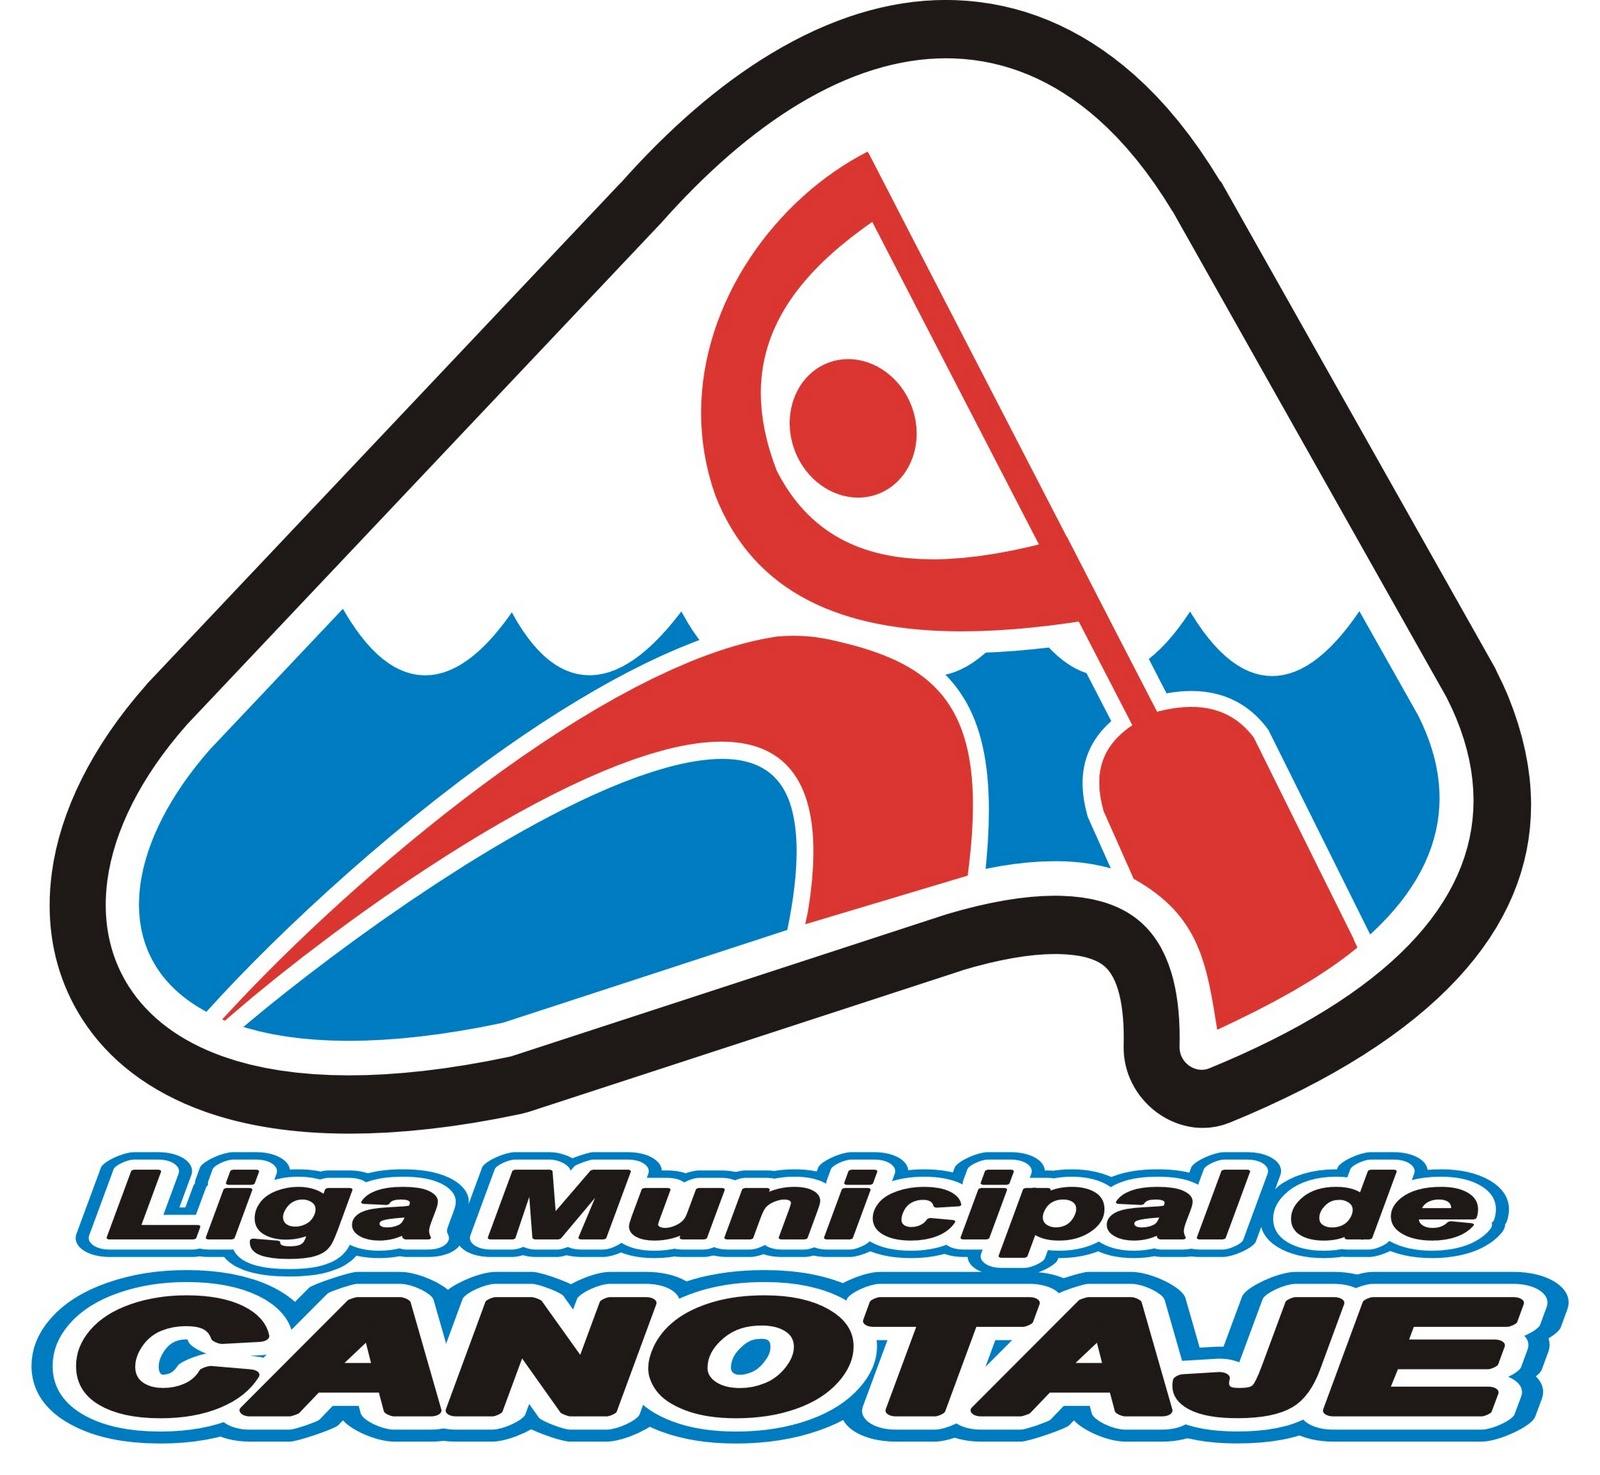 canotaje chihuahua facebook de la liga municipal de